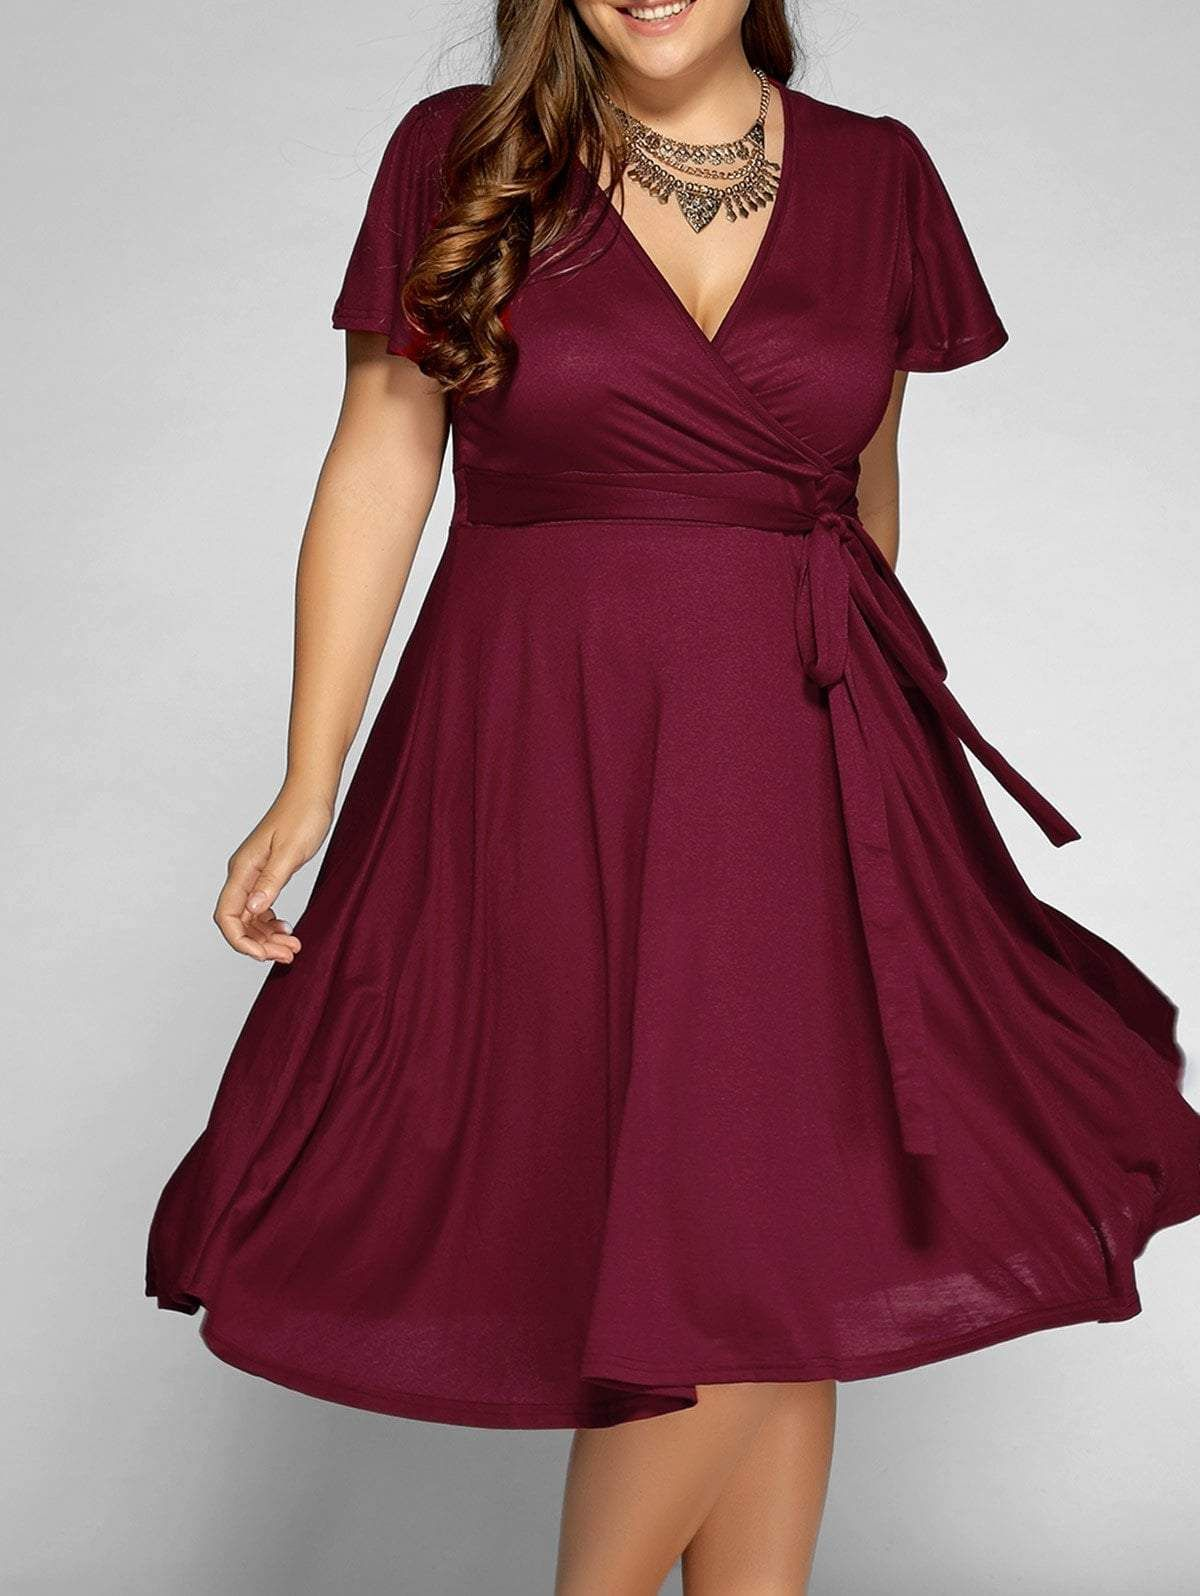 Plus Size Womens Vintage Swing Dress Evening Party Cocktail Skater A-Line Dress